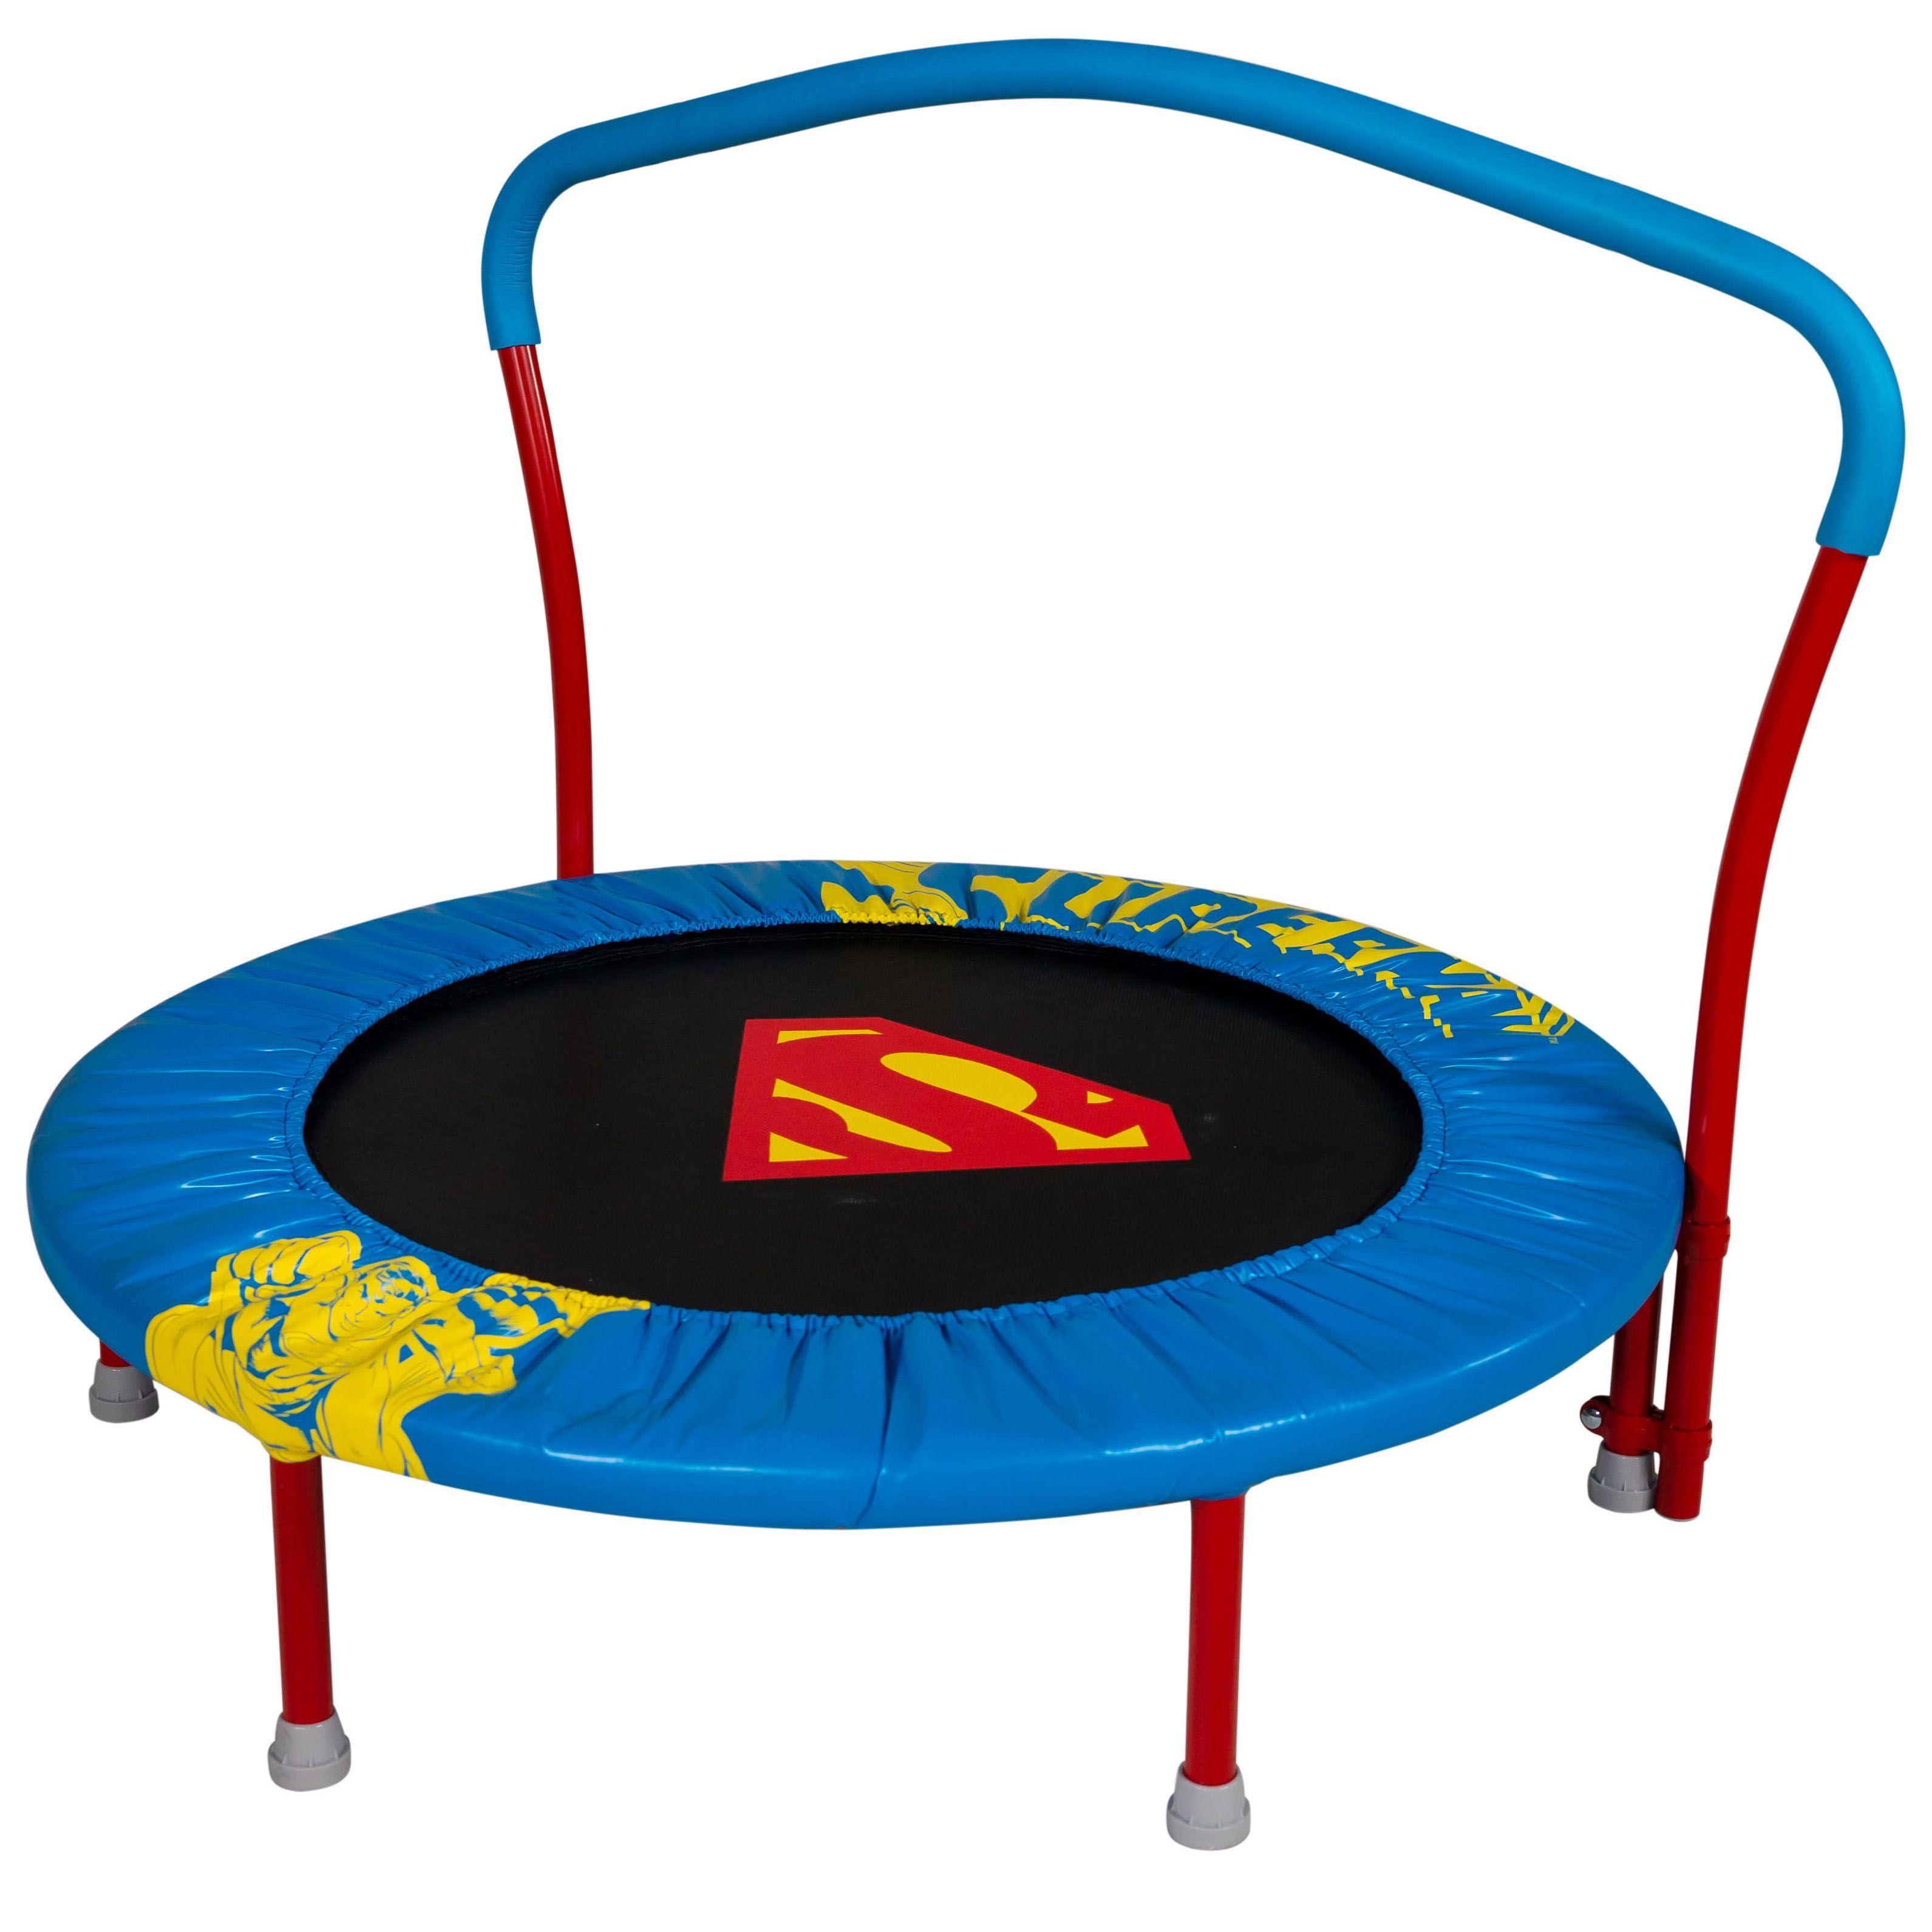 2020 Christmas Trampoline My First Superman 36 Inch Trampoline, with Handlebar   Walmart.